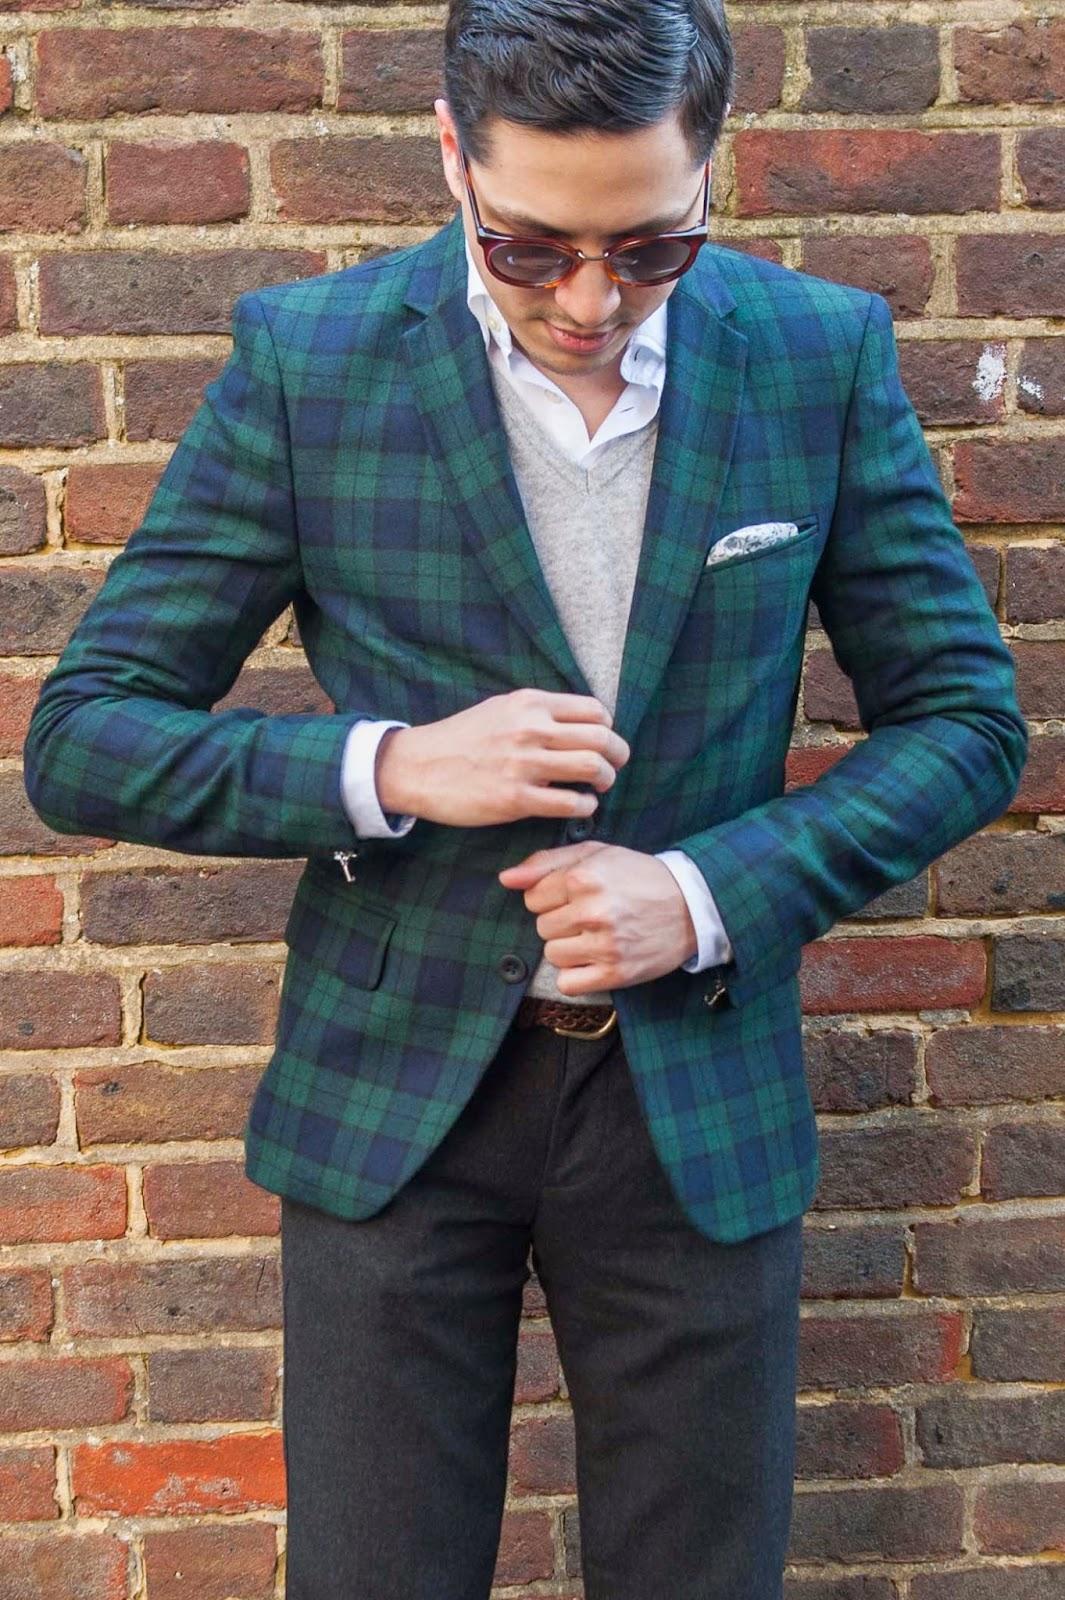 Sisley Blazer, Herringbone Sydney Shirt, Benetton Sweater, Gagliardi Pocket Square, Uniqlo Pants, Herring Shoes